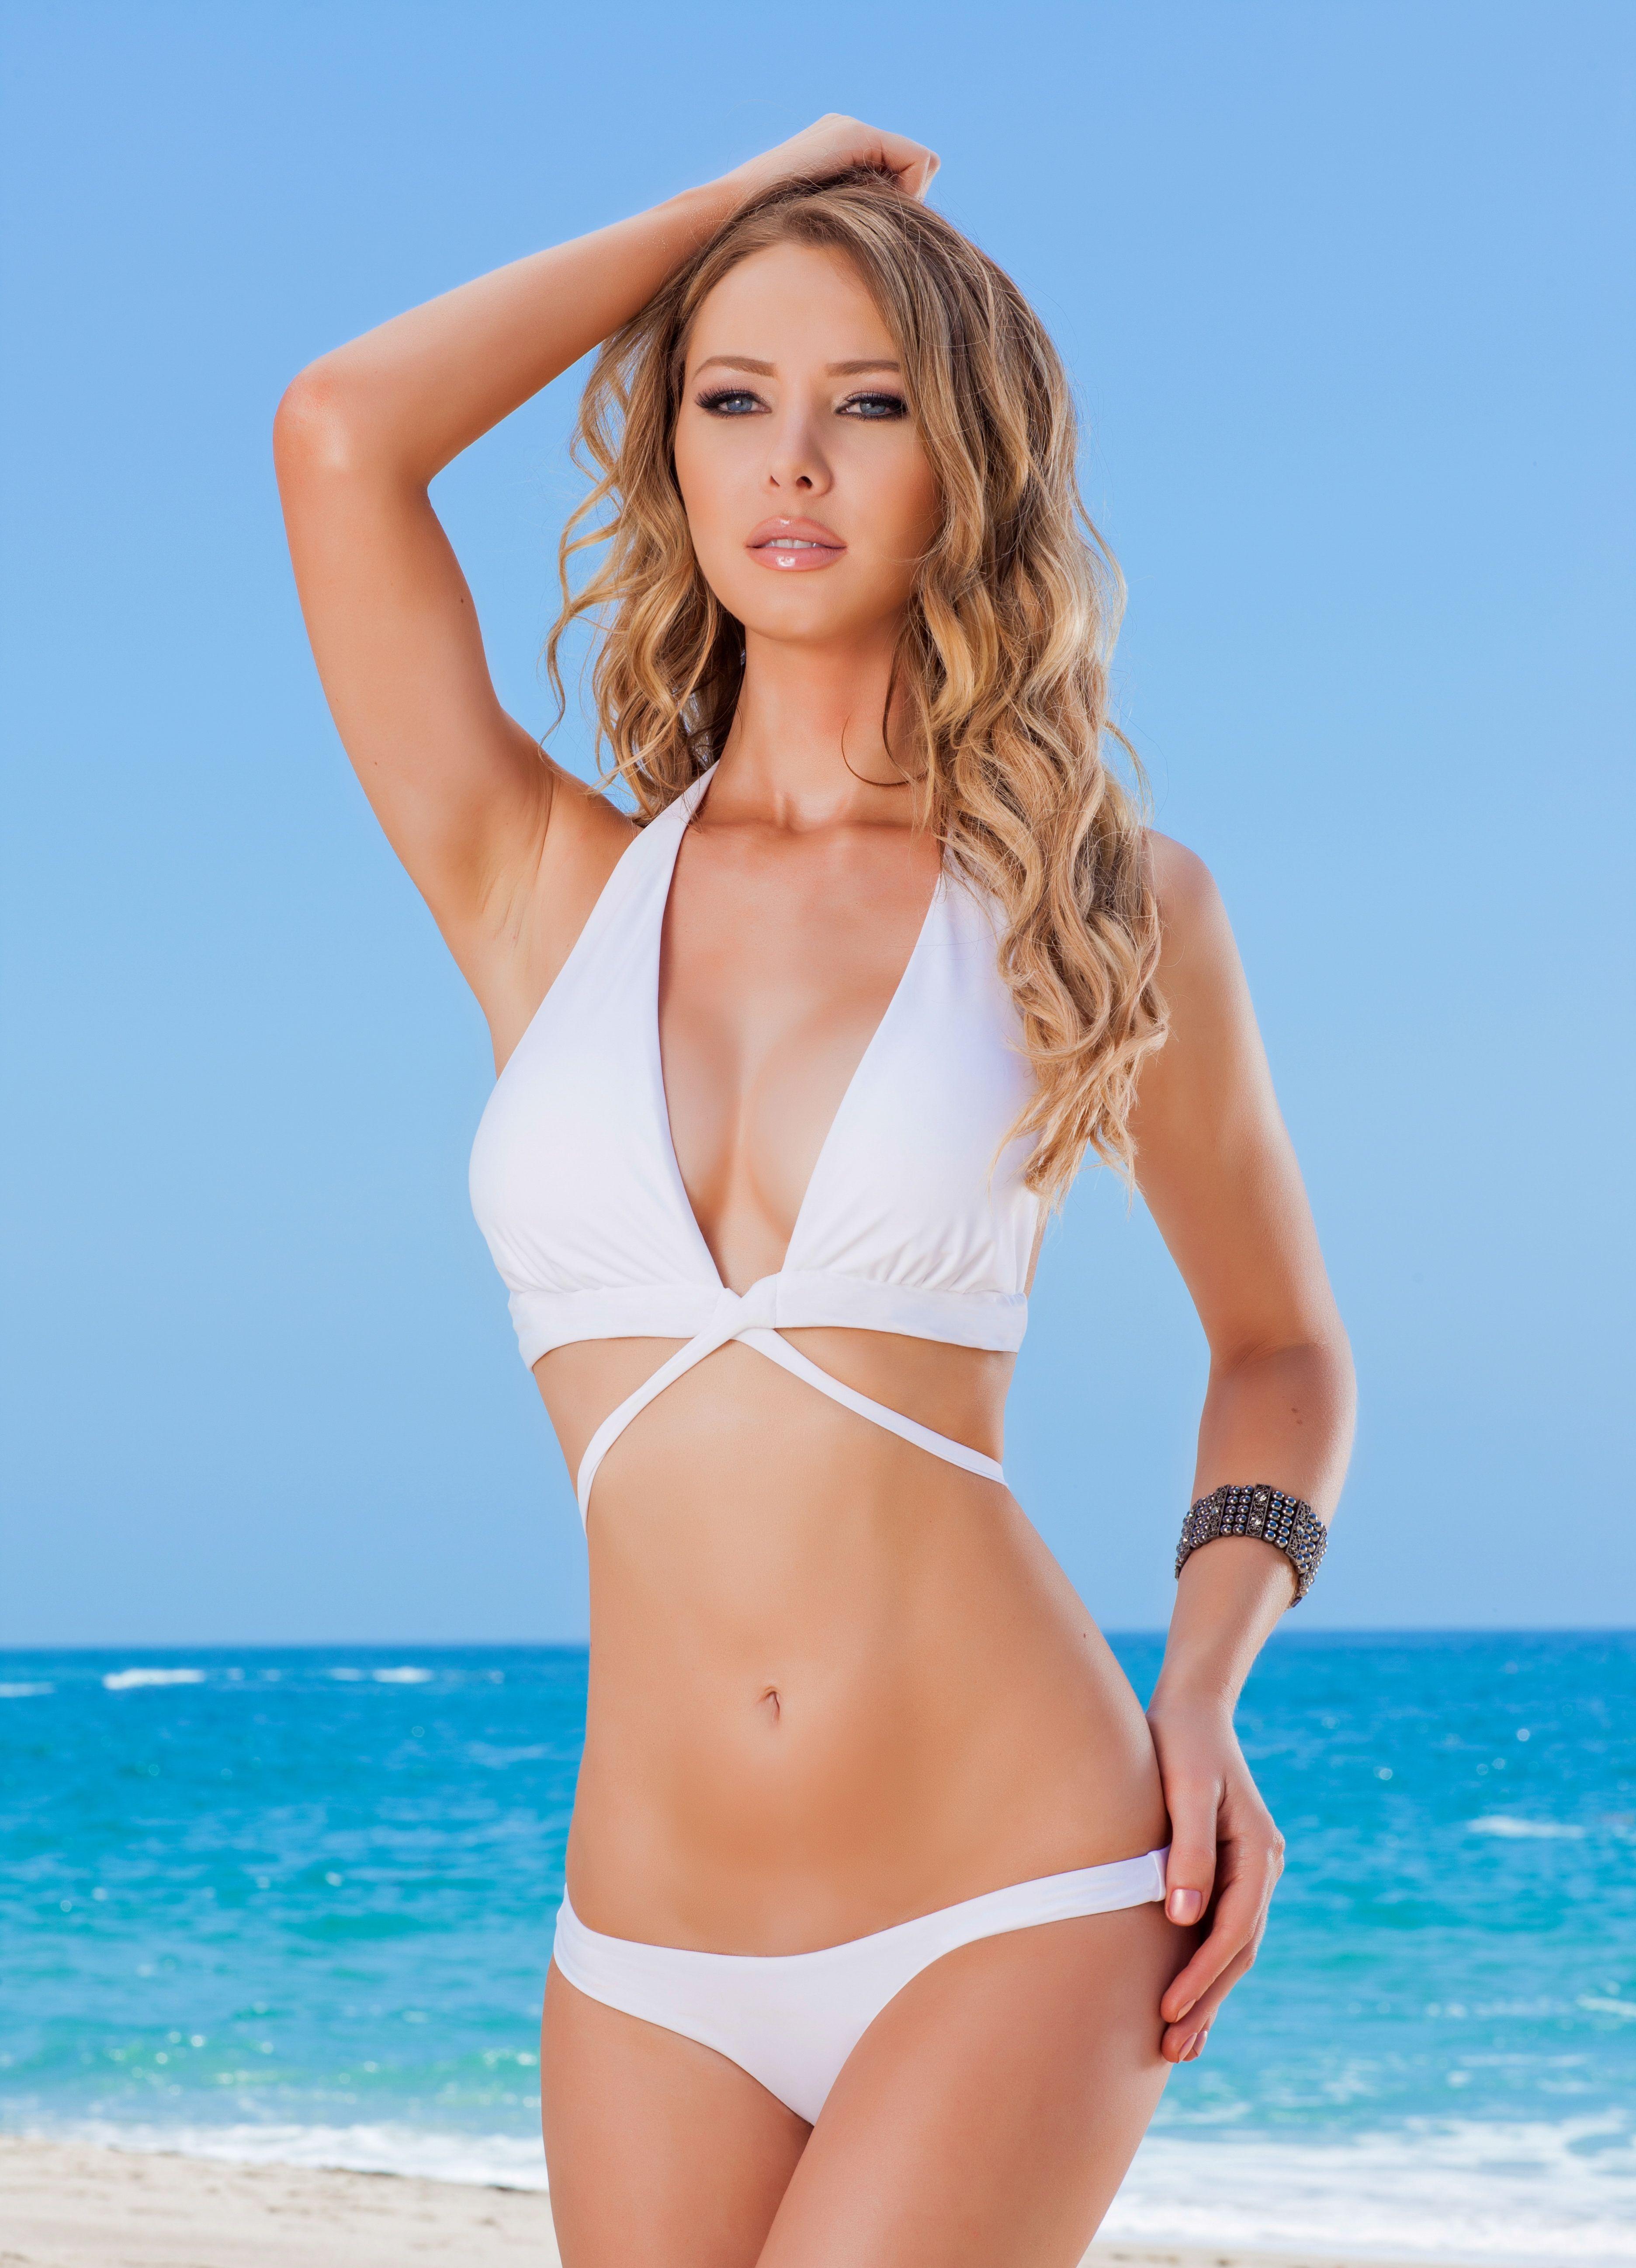 Vanna white bikini swimsuit pictures